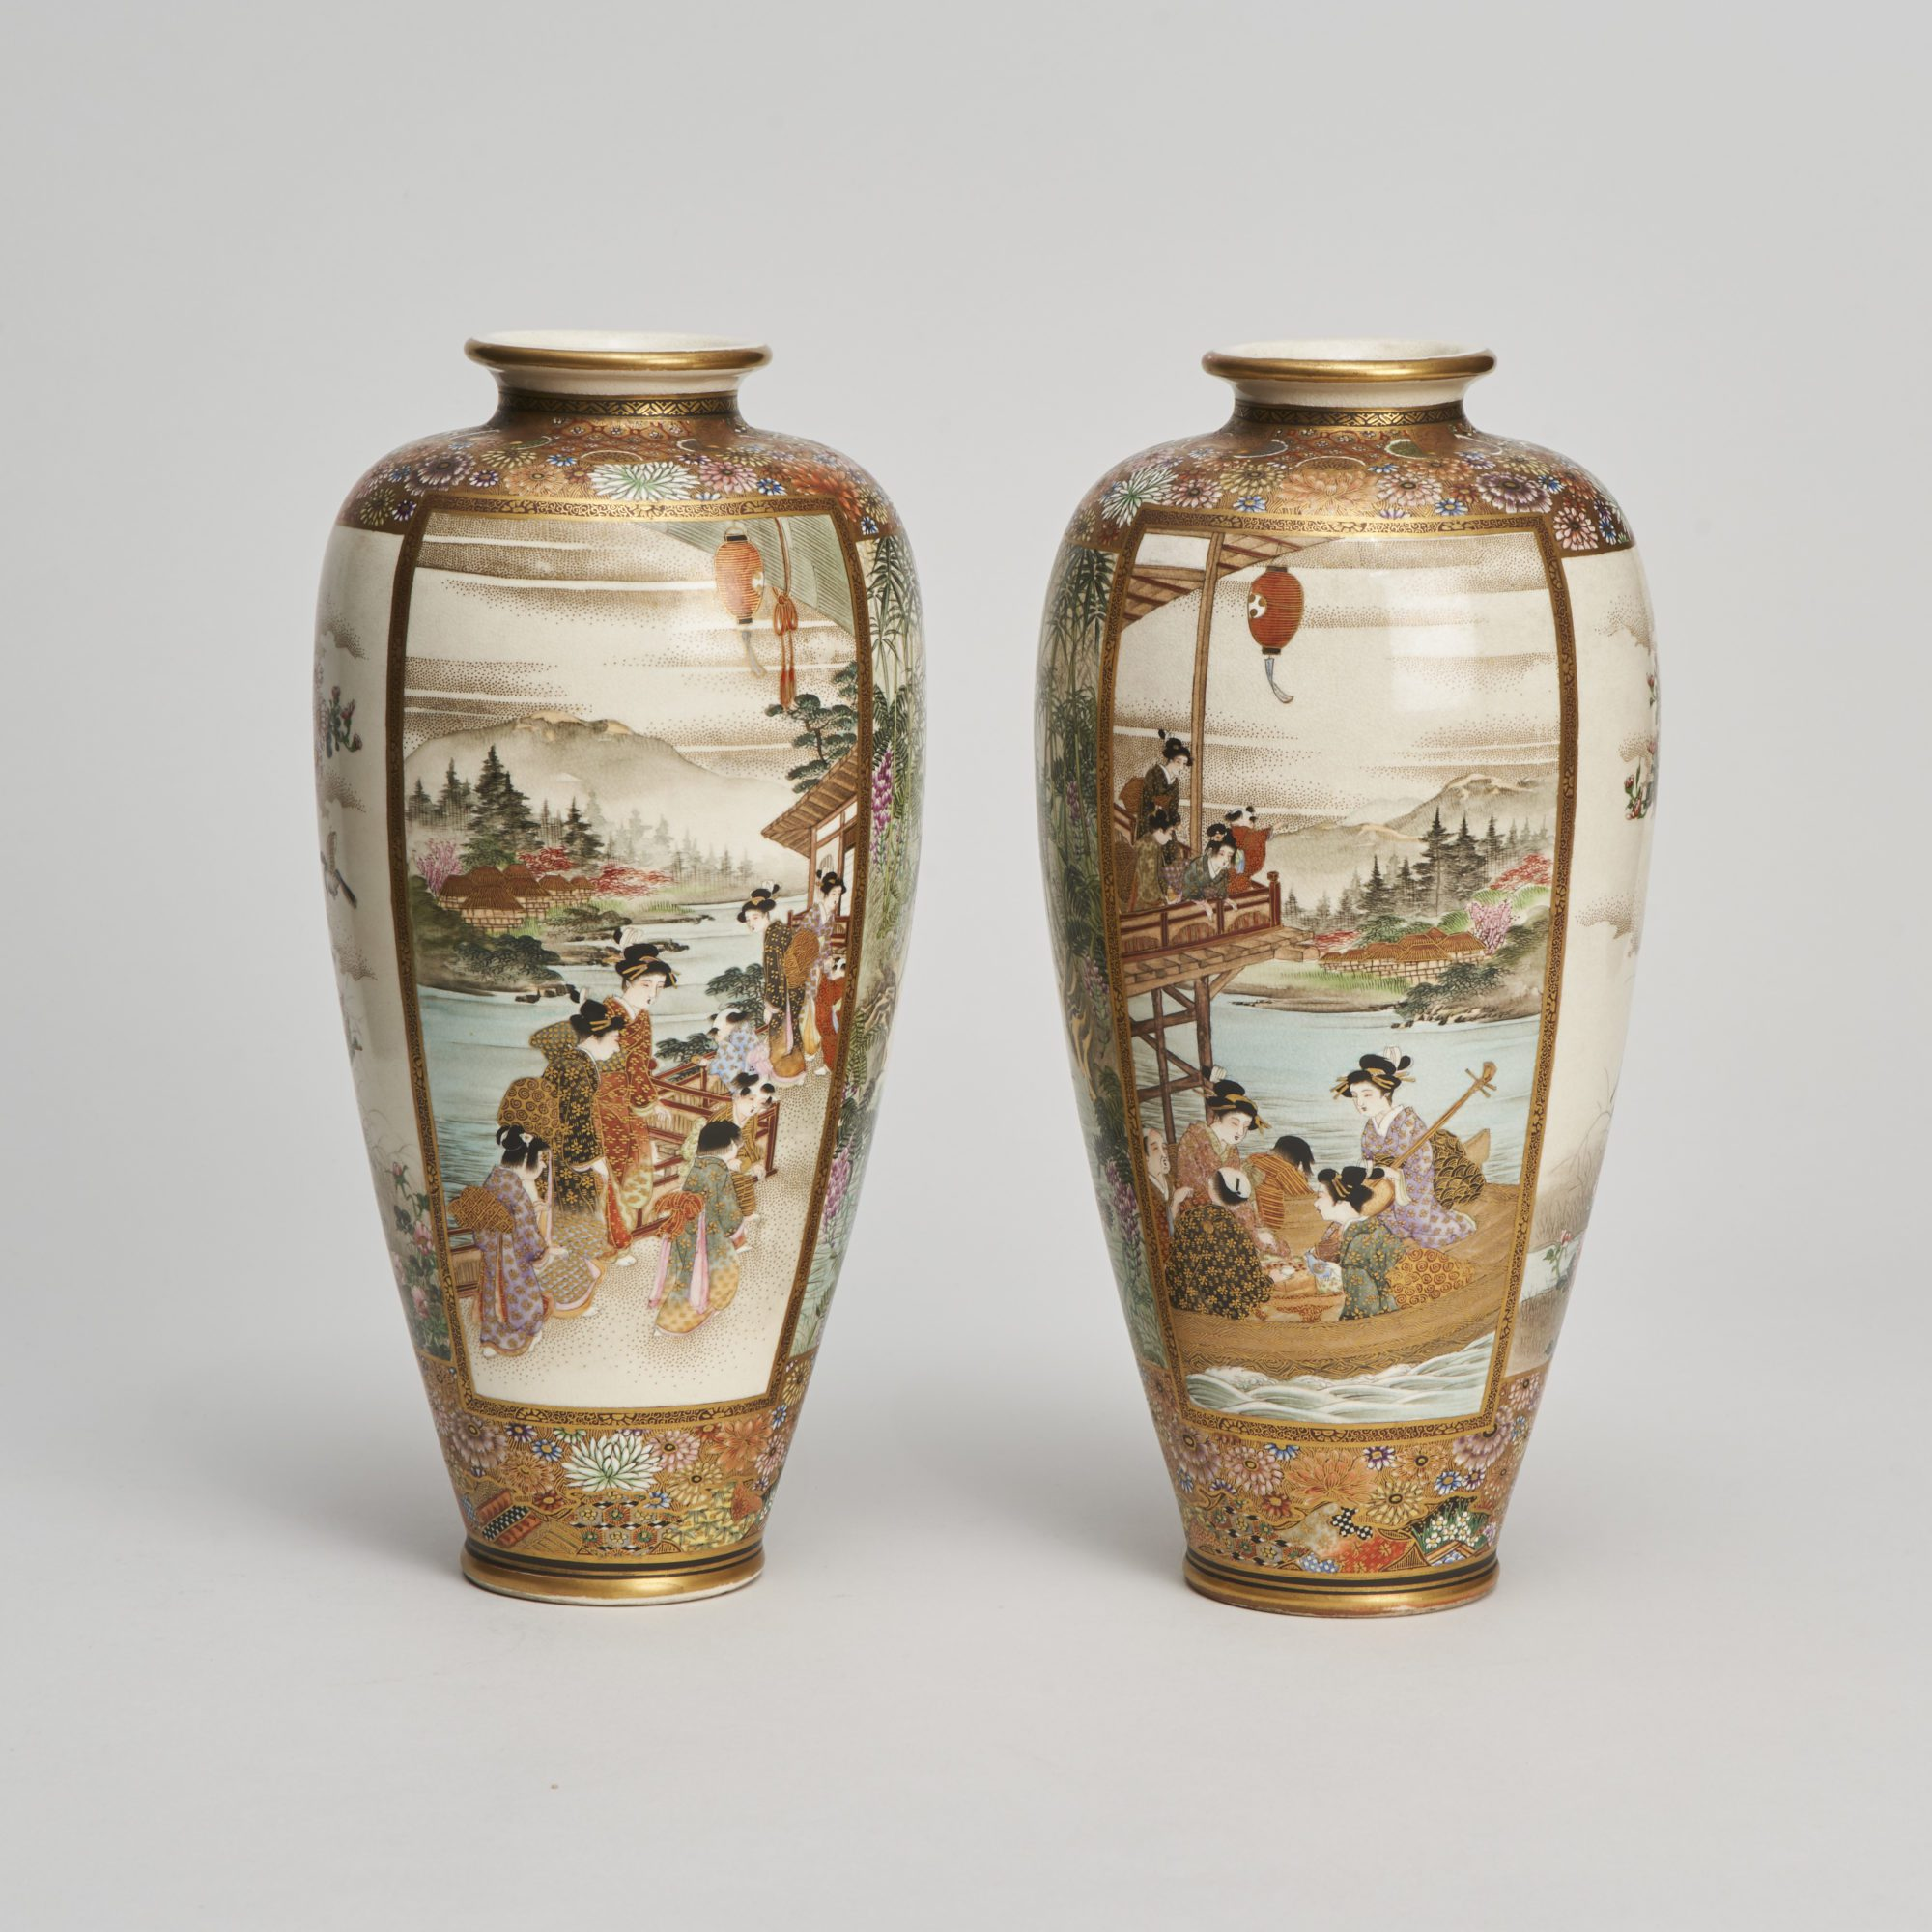 Ryozan Satsuma ware   A pair of Japanese Meiji Period satsuma vases signed by Ryozan